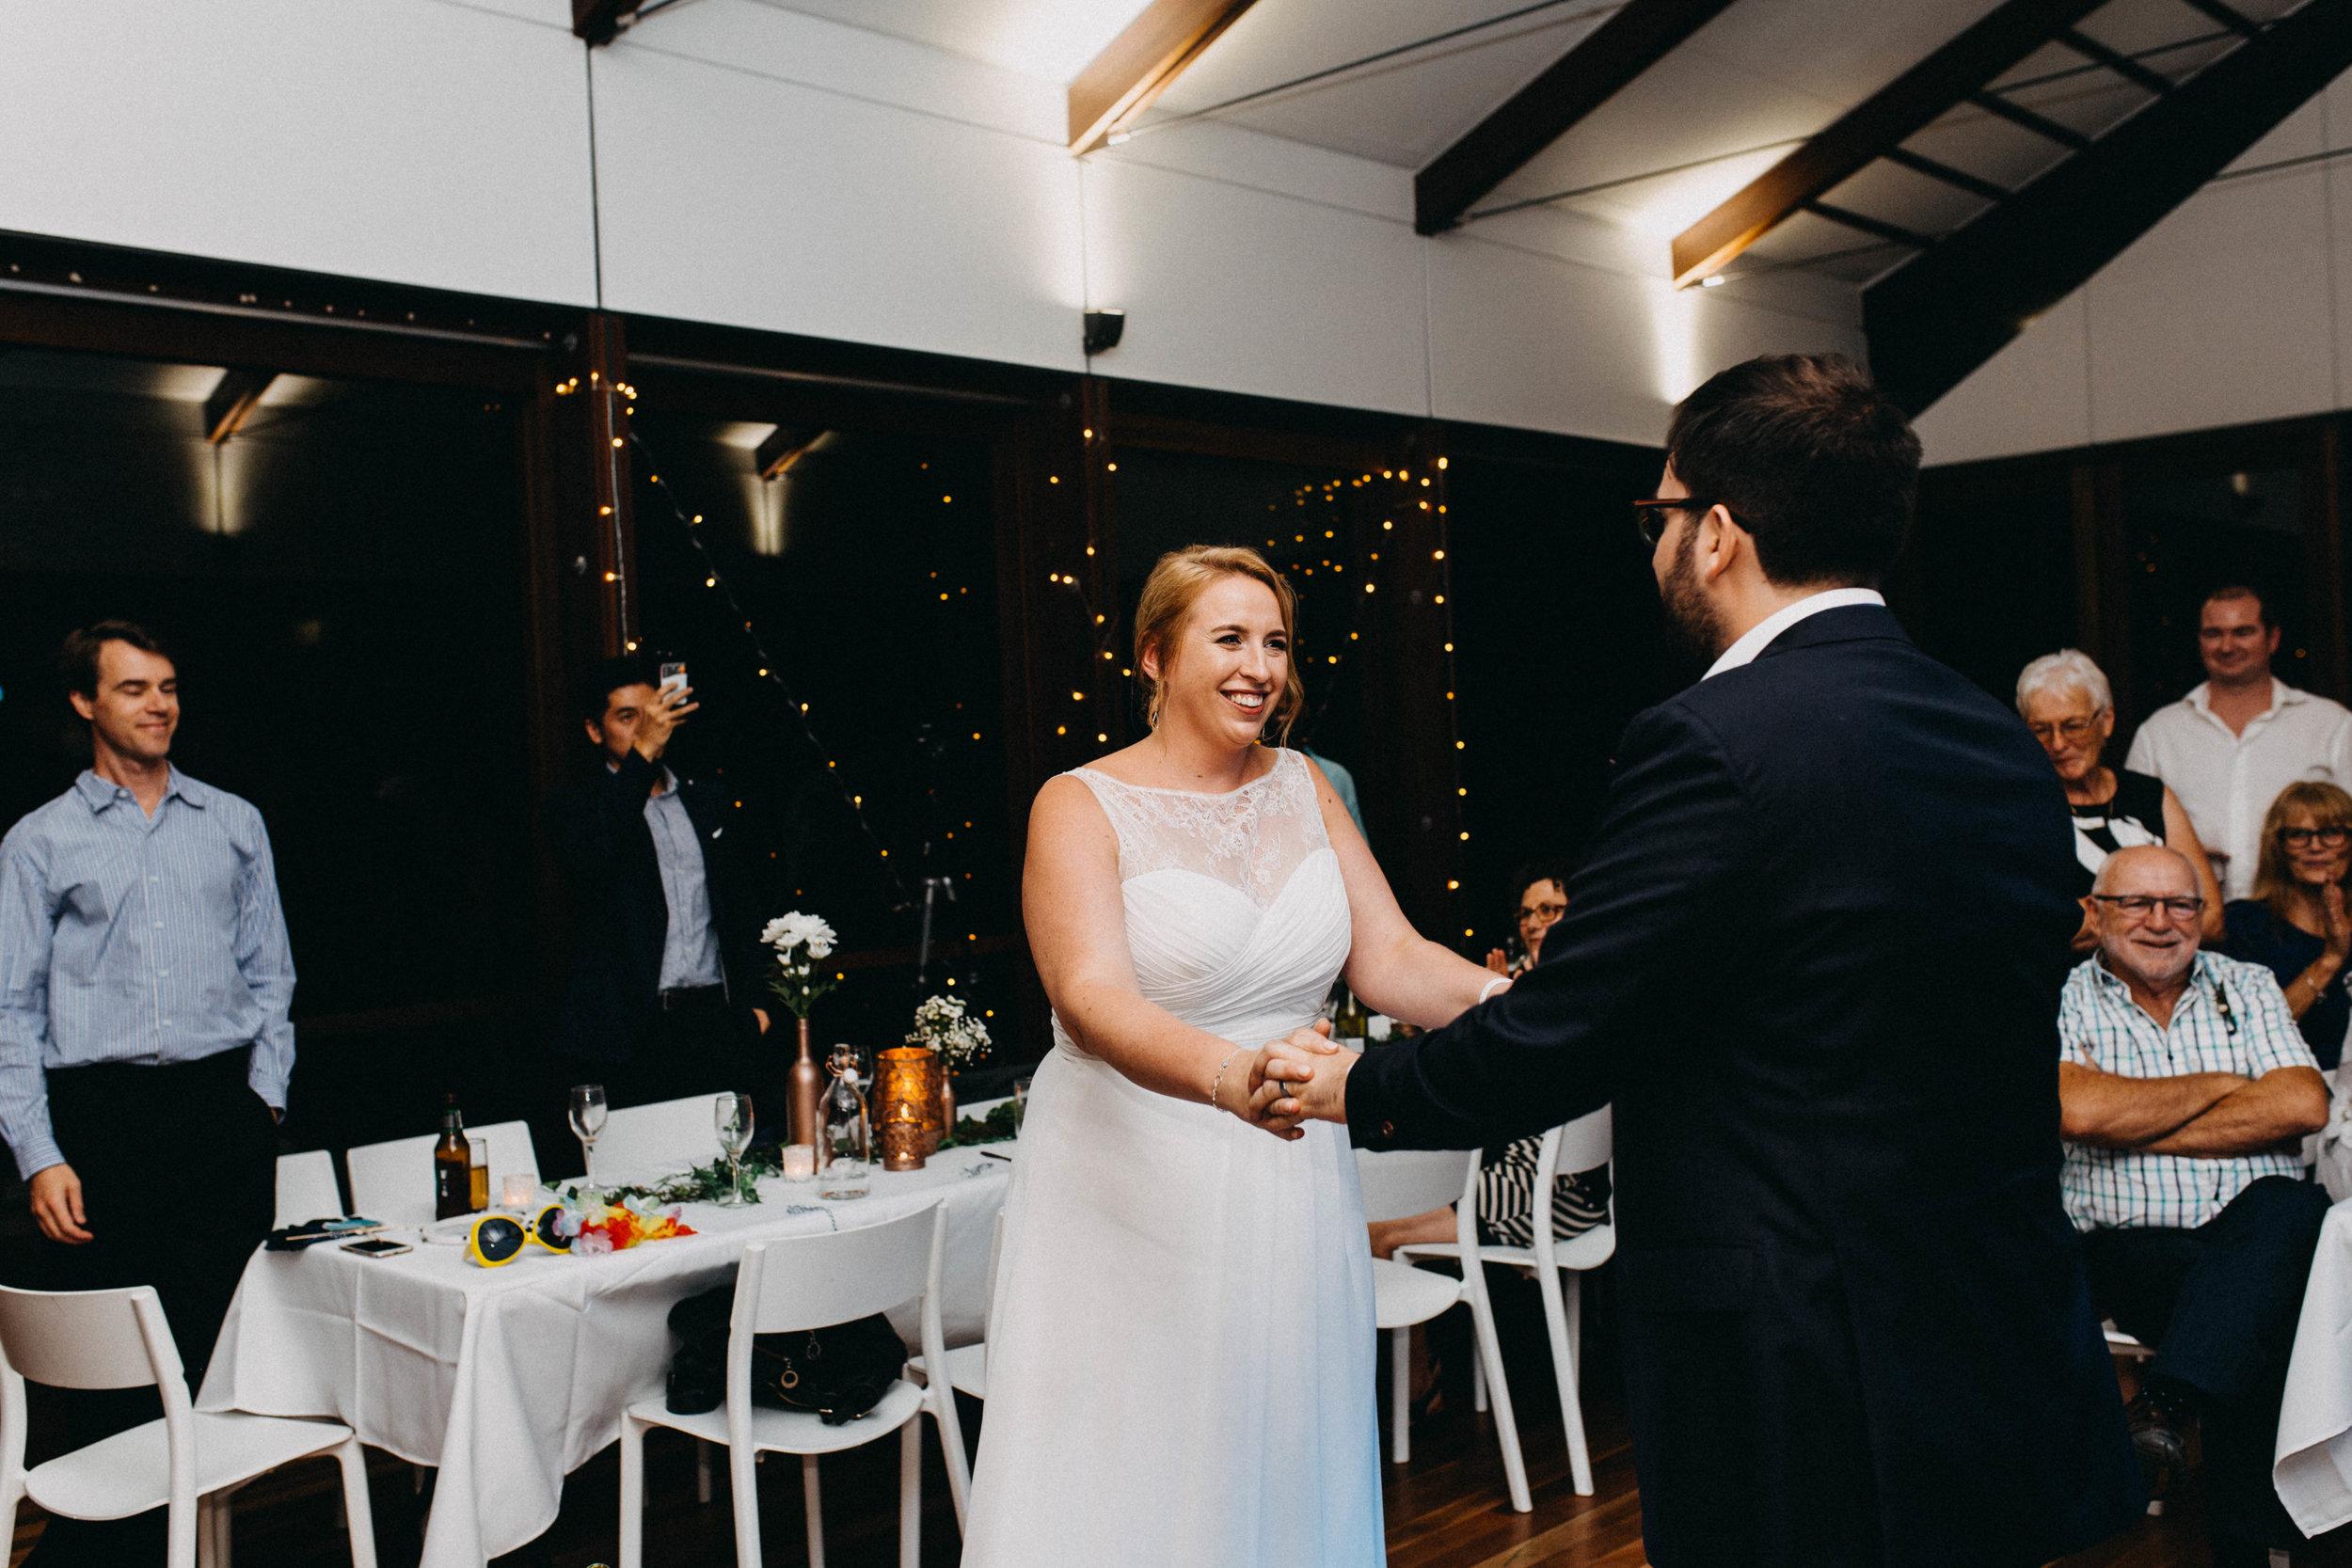 cabarita-park-sydney-wedding-emilyobrienphotography.net-89.jpg